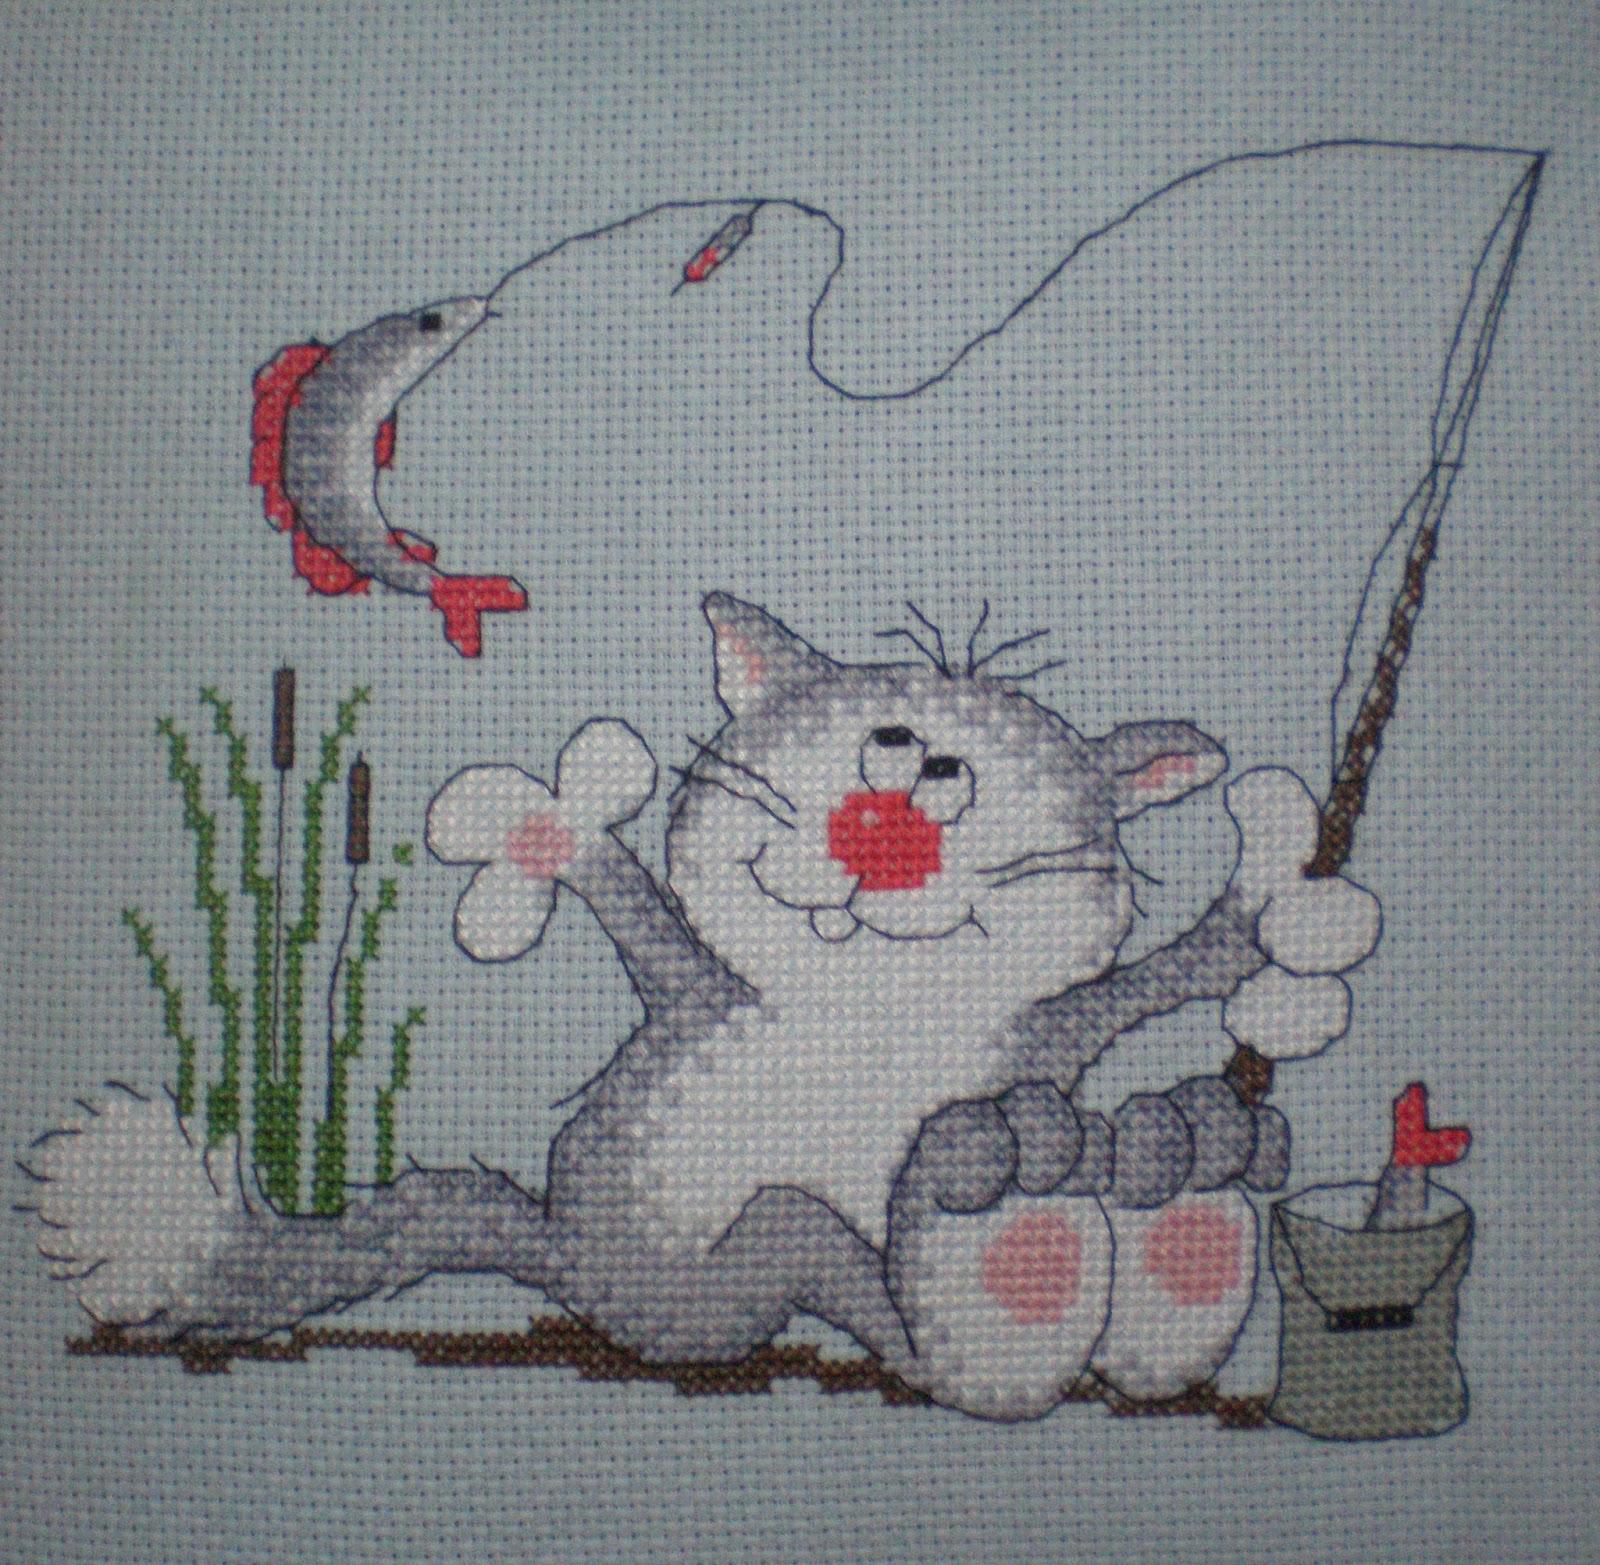 Вышивка мальчик рыбак 59